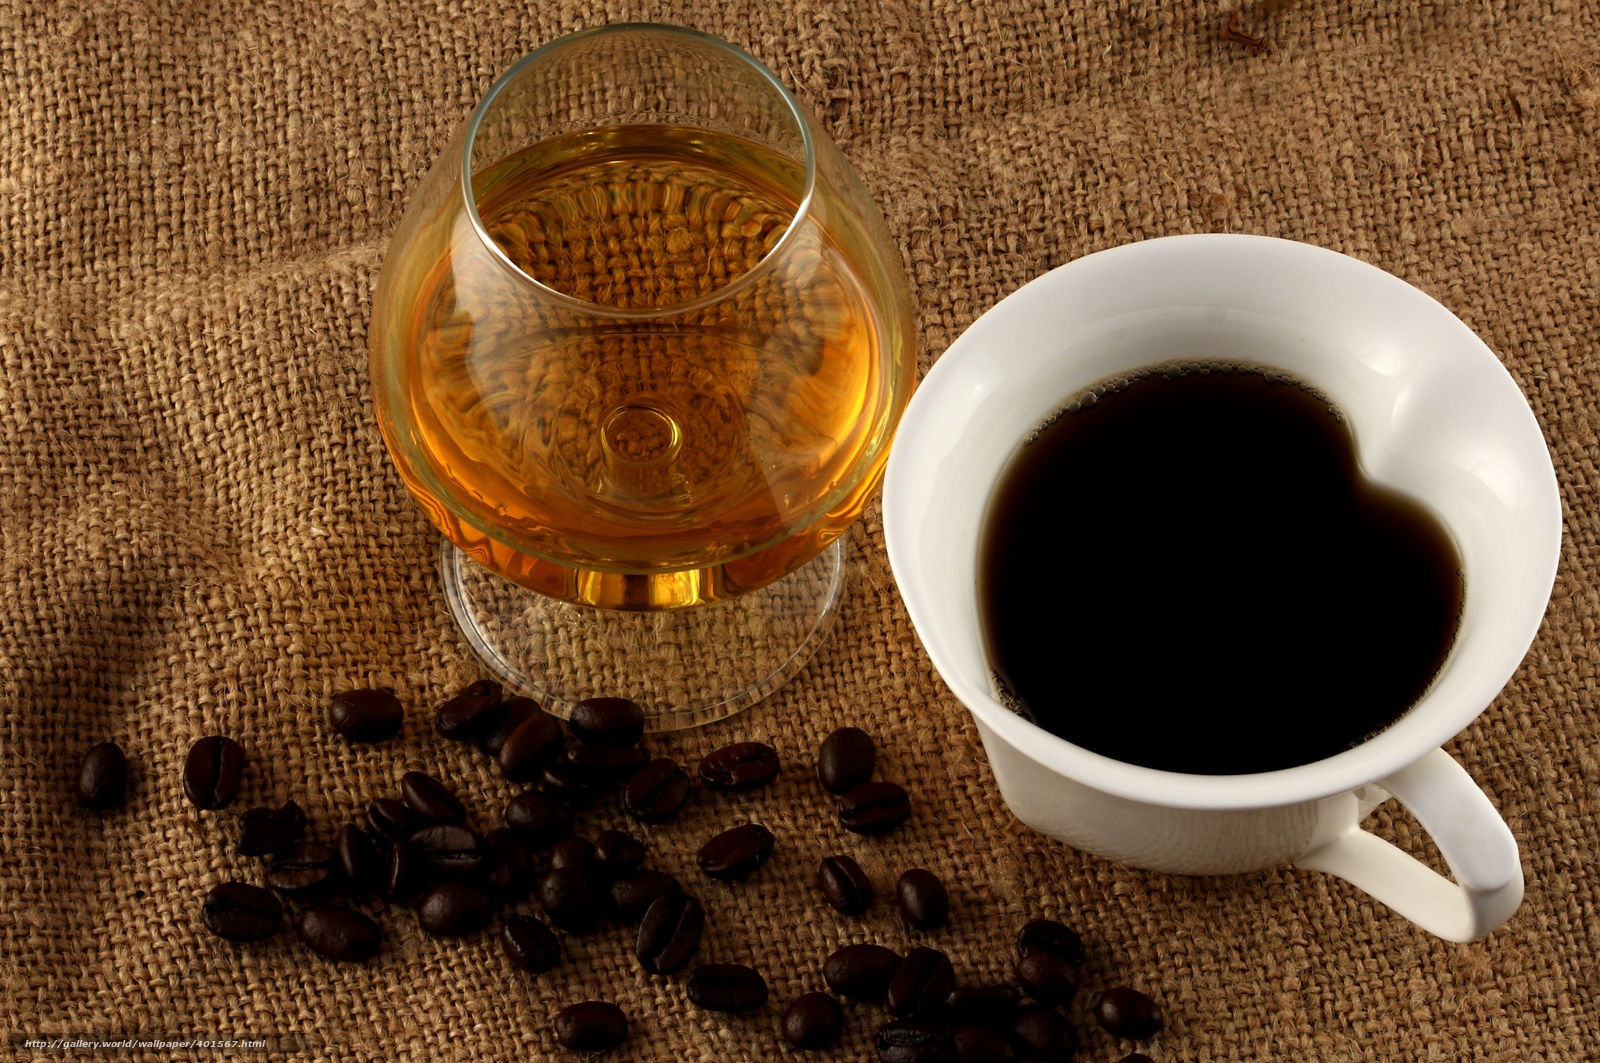 Download wallpaper Brandy,  goblet,  coffee,  grain free desktop wallpaper in the resolution 6080x4040 — picture №401567